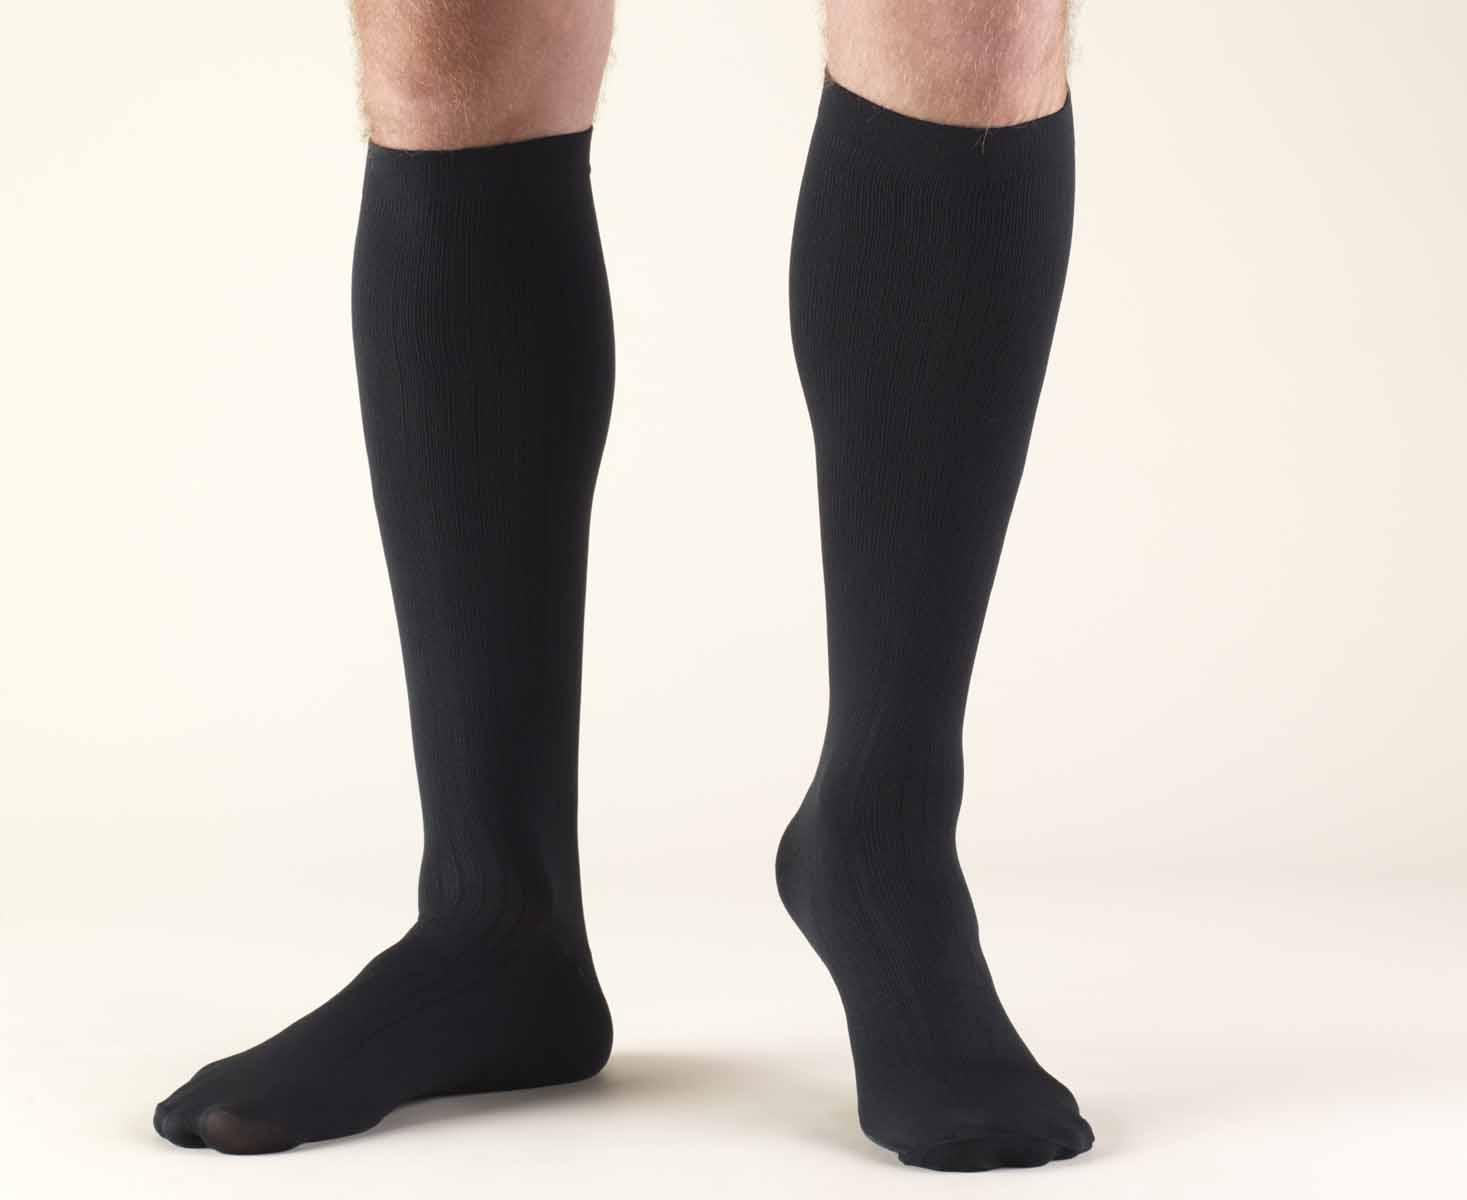 a1d12bff2 Activa Men s Dress Socks 15-20 mmHg Closed Toe